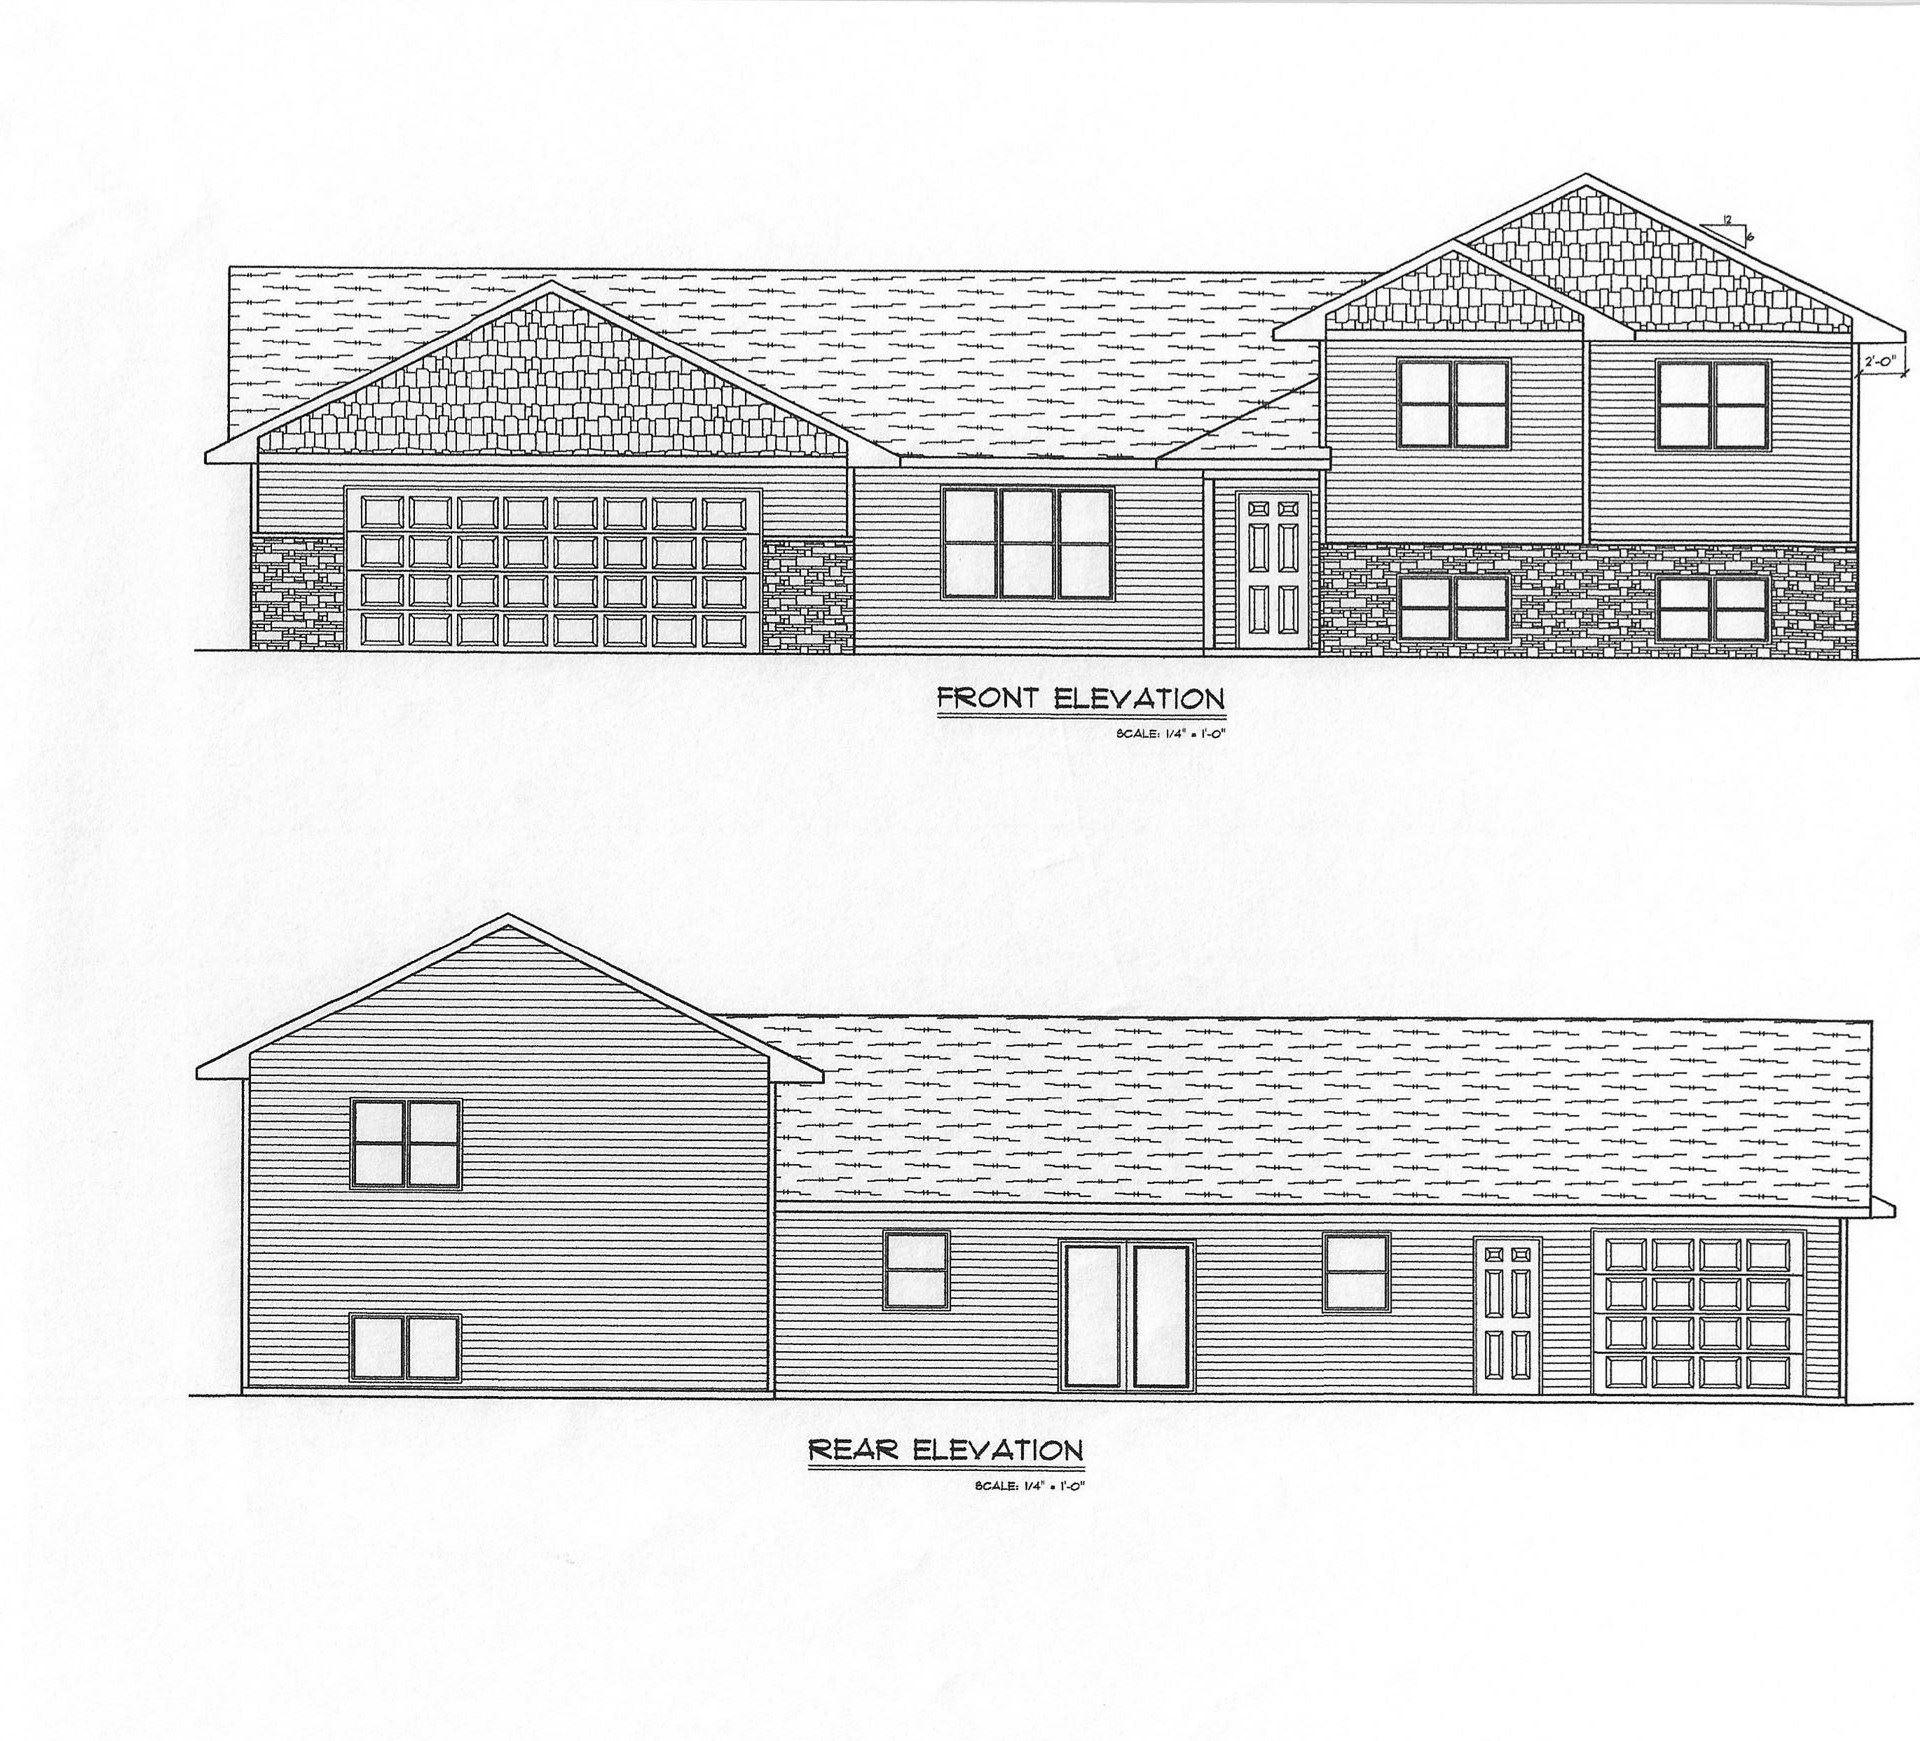 28 S Windmill Ridge Rd, Evansville, WI 53536 - #: 1918860